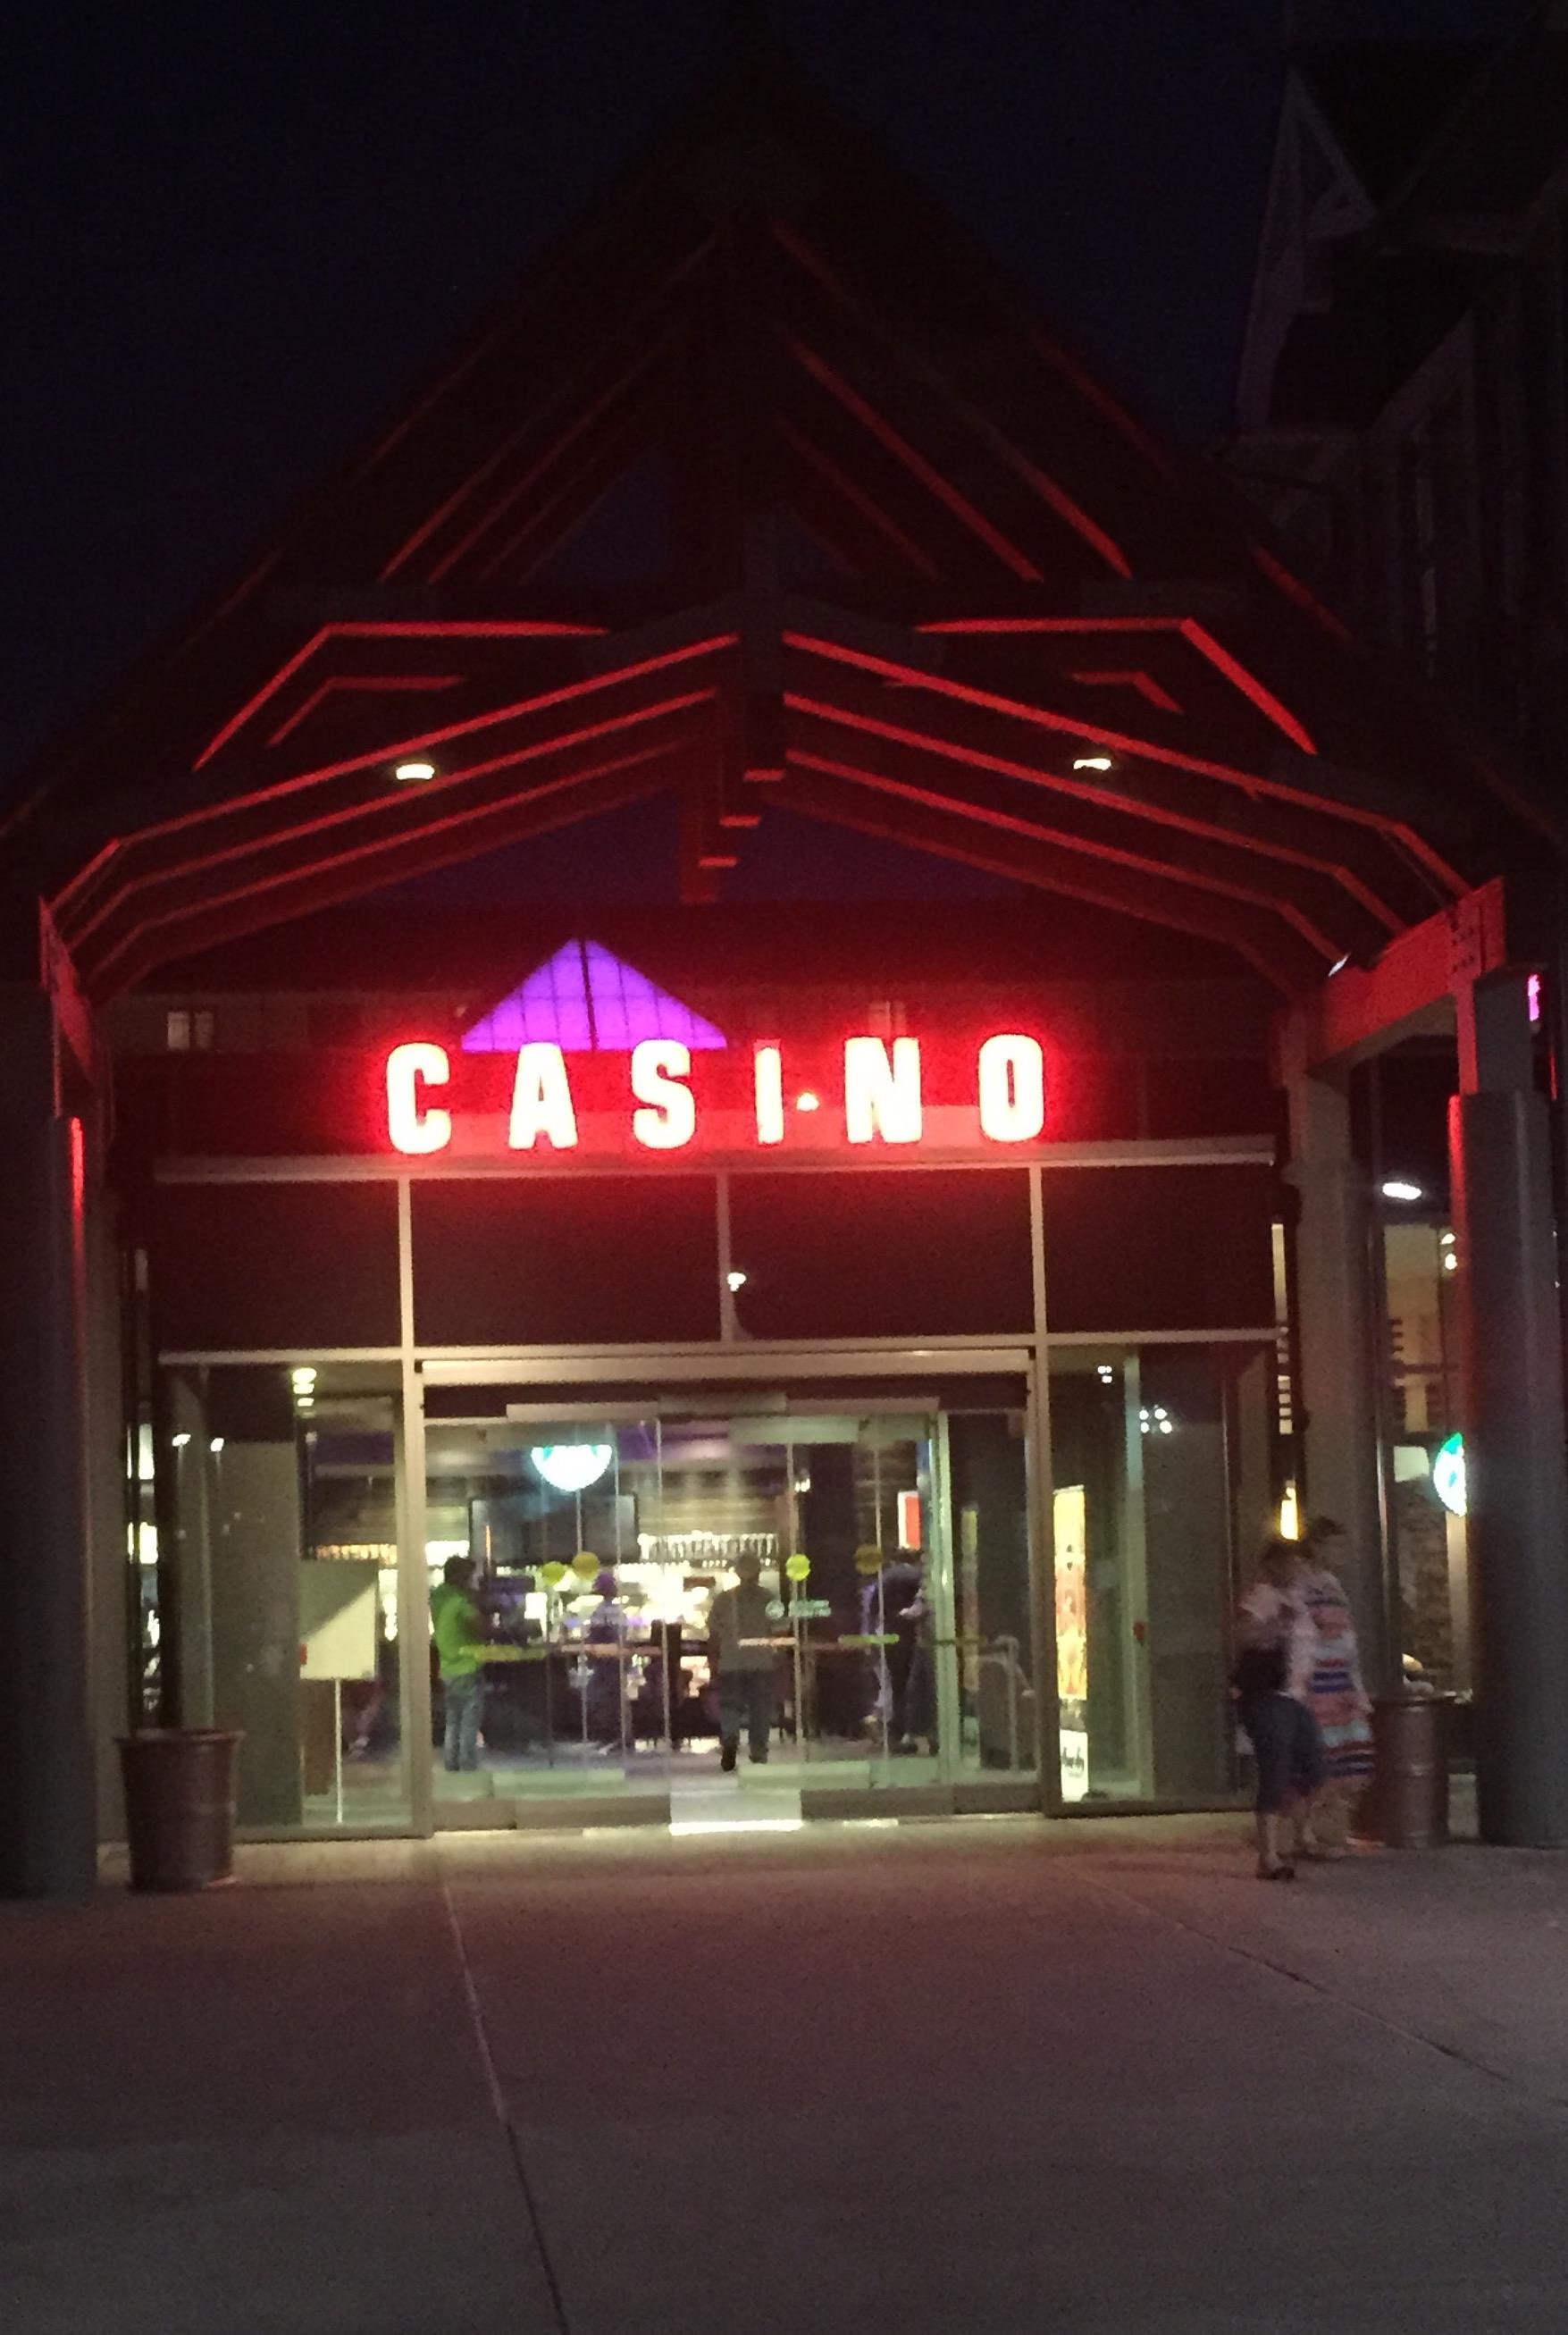 gambling movies, casino visit, gambling, slot machines